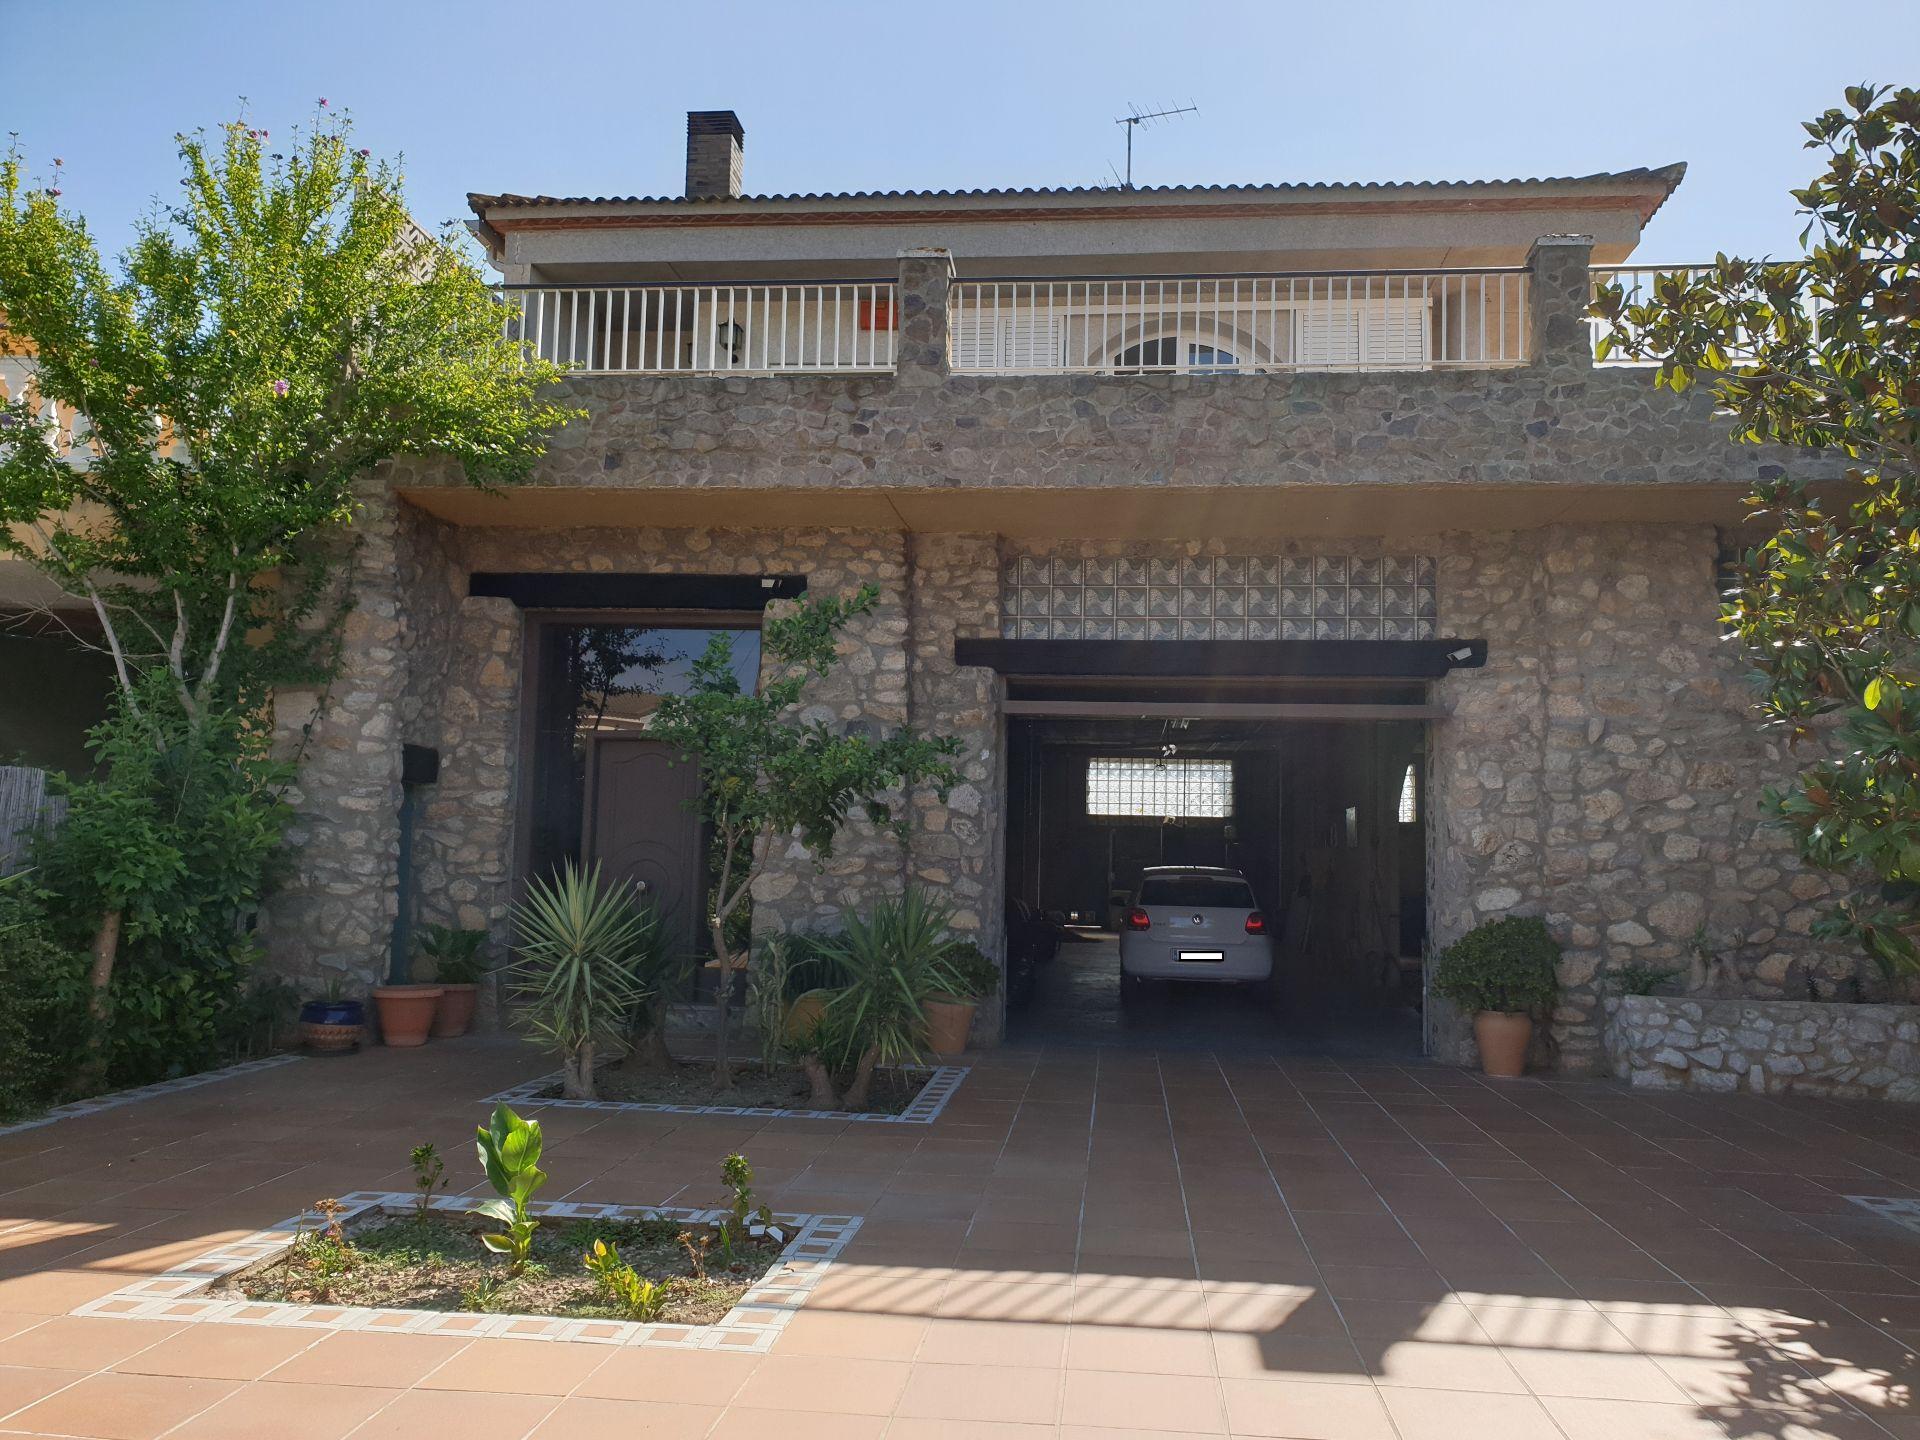 Villa à Llers, Hostalets de Llers, vente